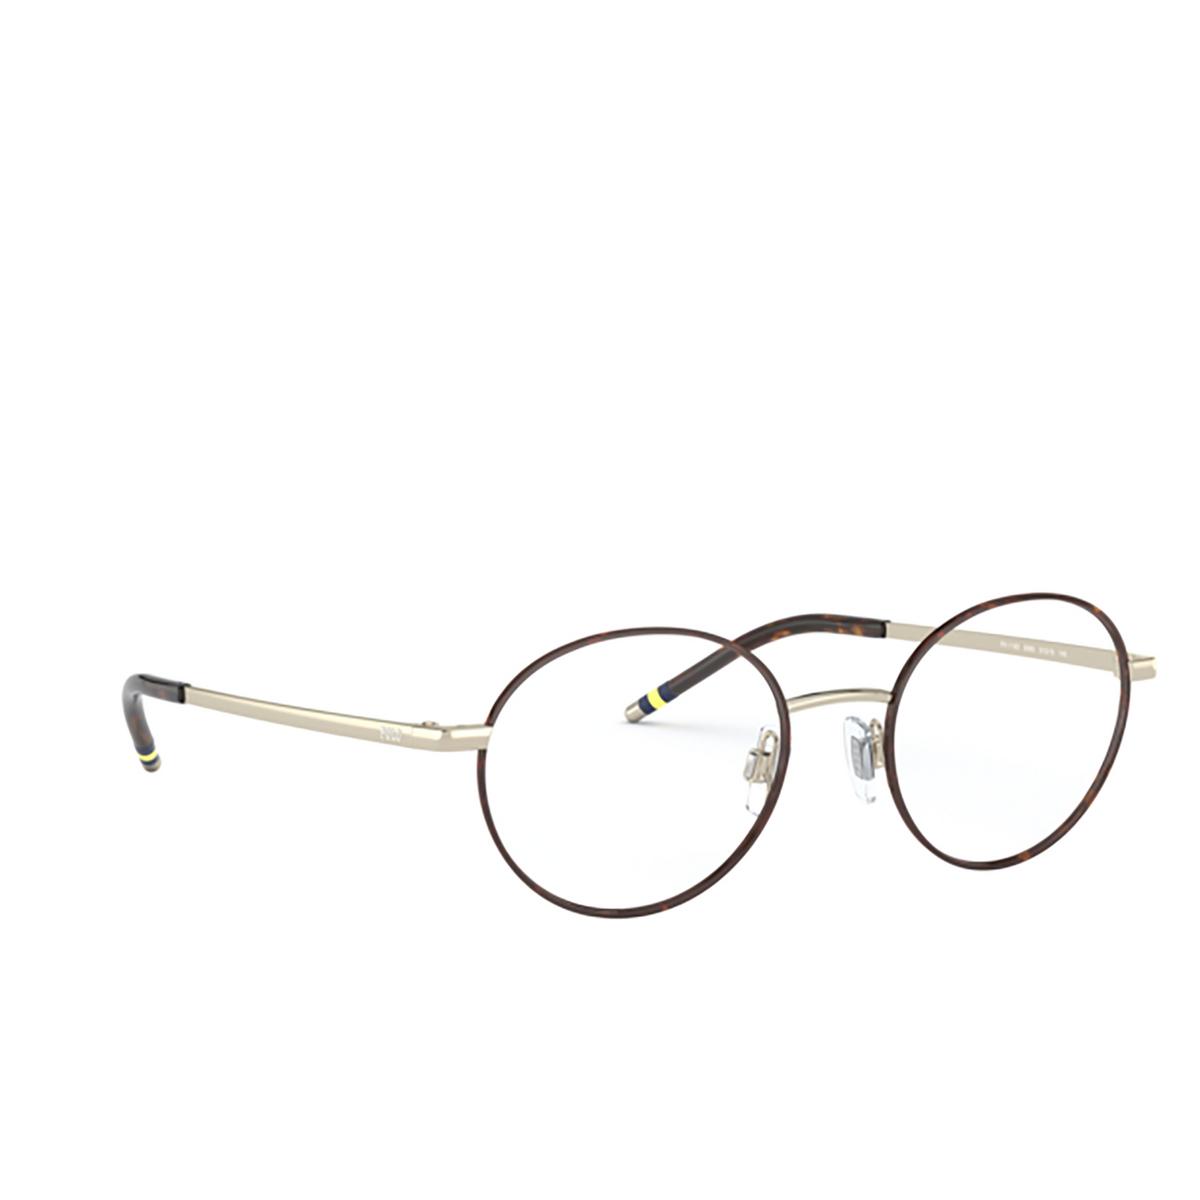 Polo Ralph Lauren® Oval Eyeglasses: PH1193 color Havana On Shiny Pale Gold 9393.